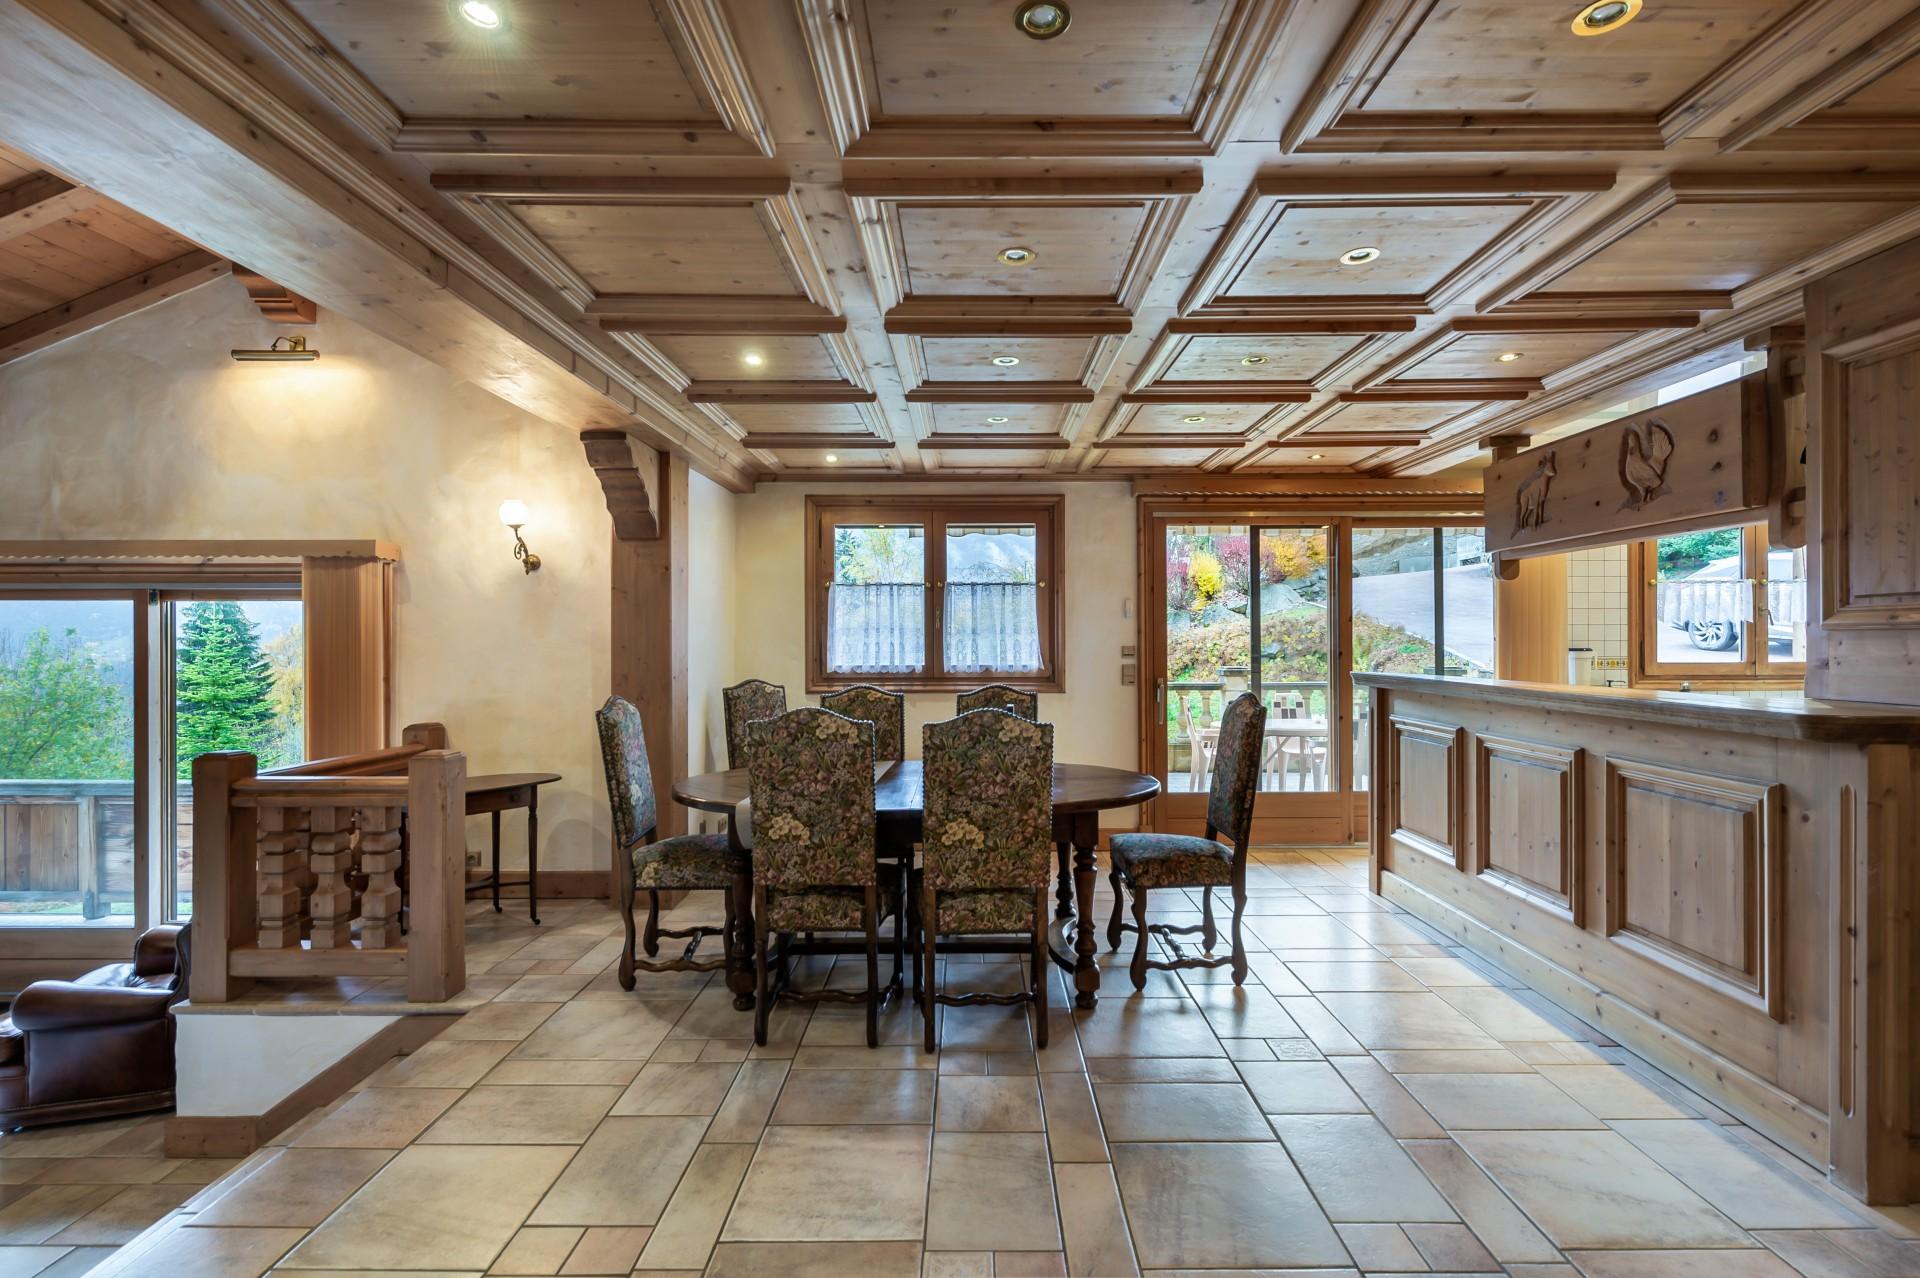 Saint Gervais Luxury Rental Chalet Galena Dining Room 3